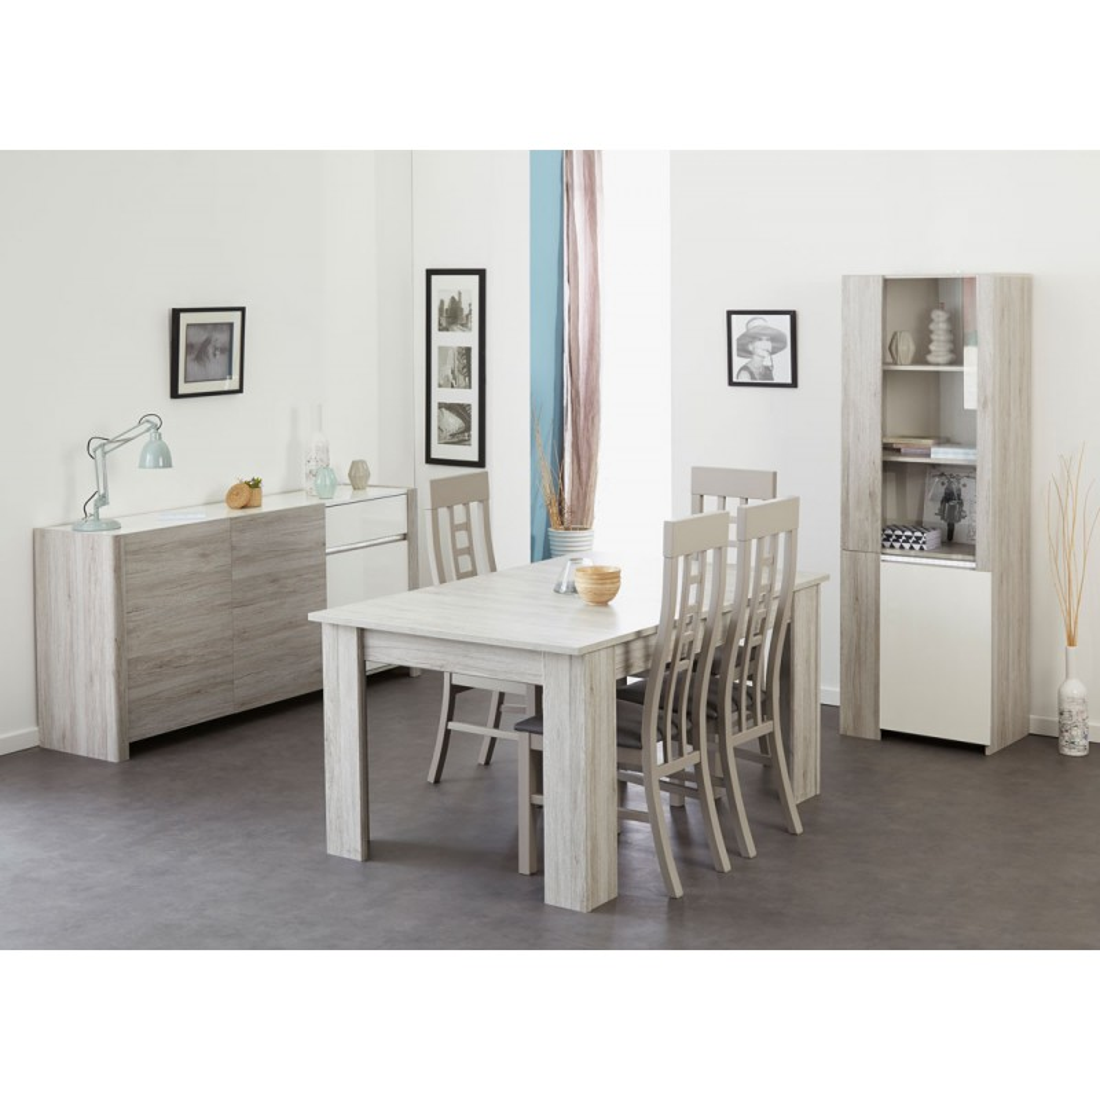 Salle manger compl te gris blanc brillant leo n 1 for Salle a manger gris blanc